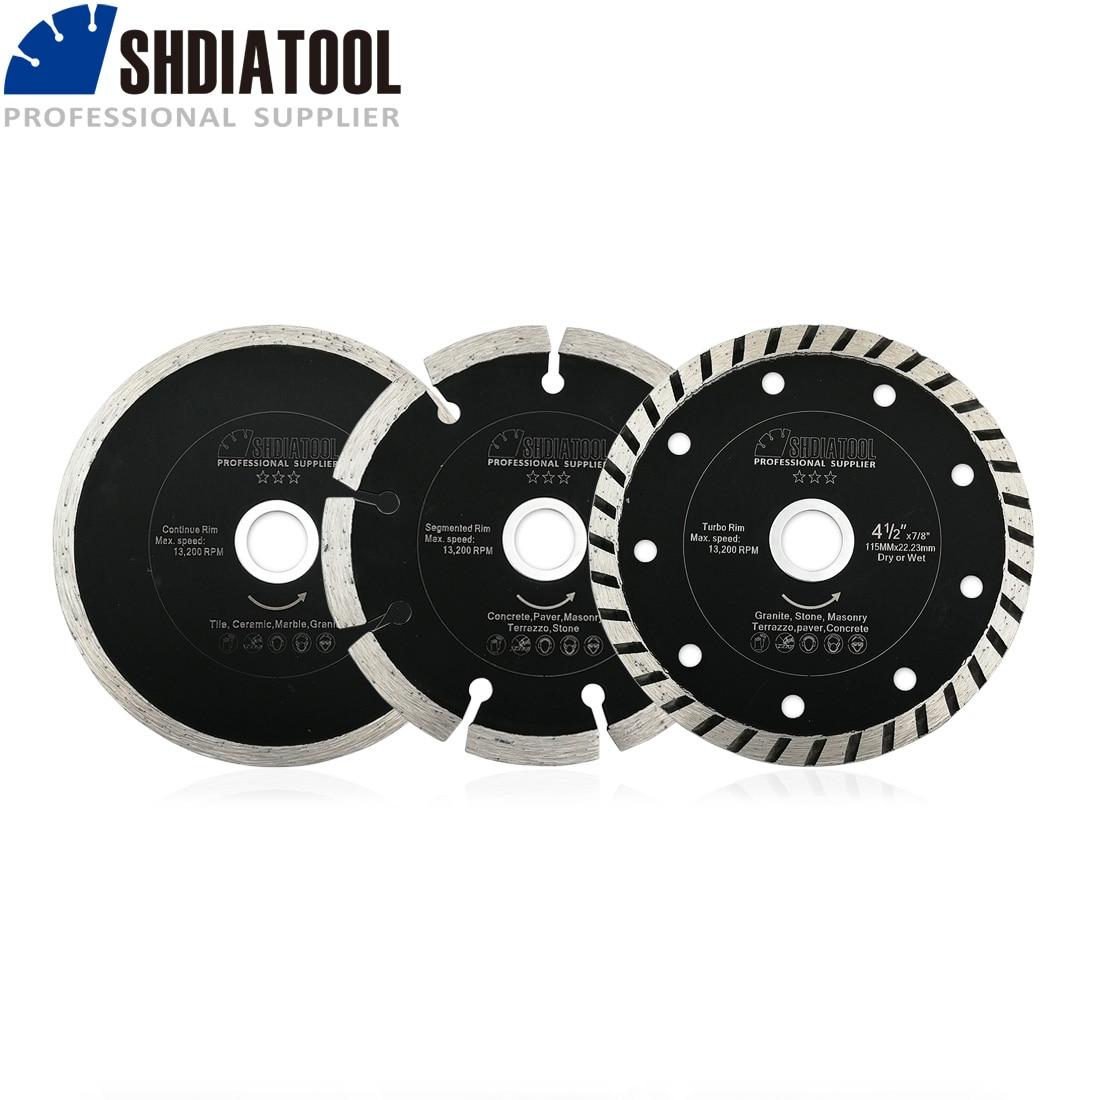 SHDIATOOL 3pcs/setDia 115mm/4.5